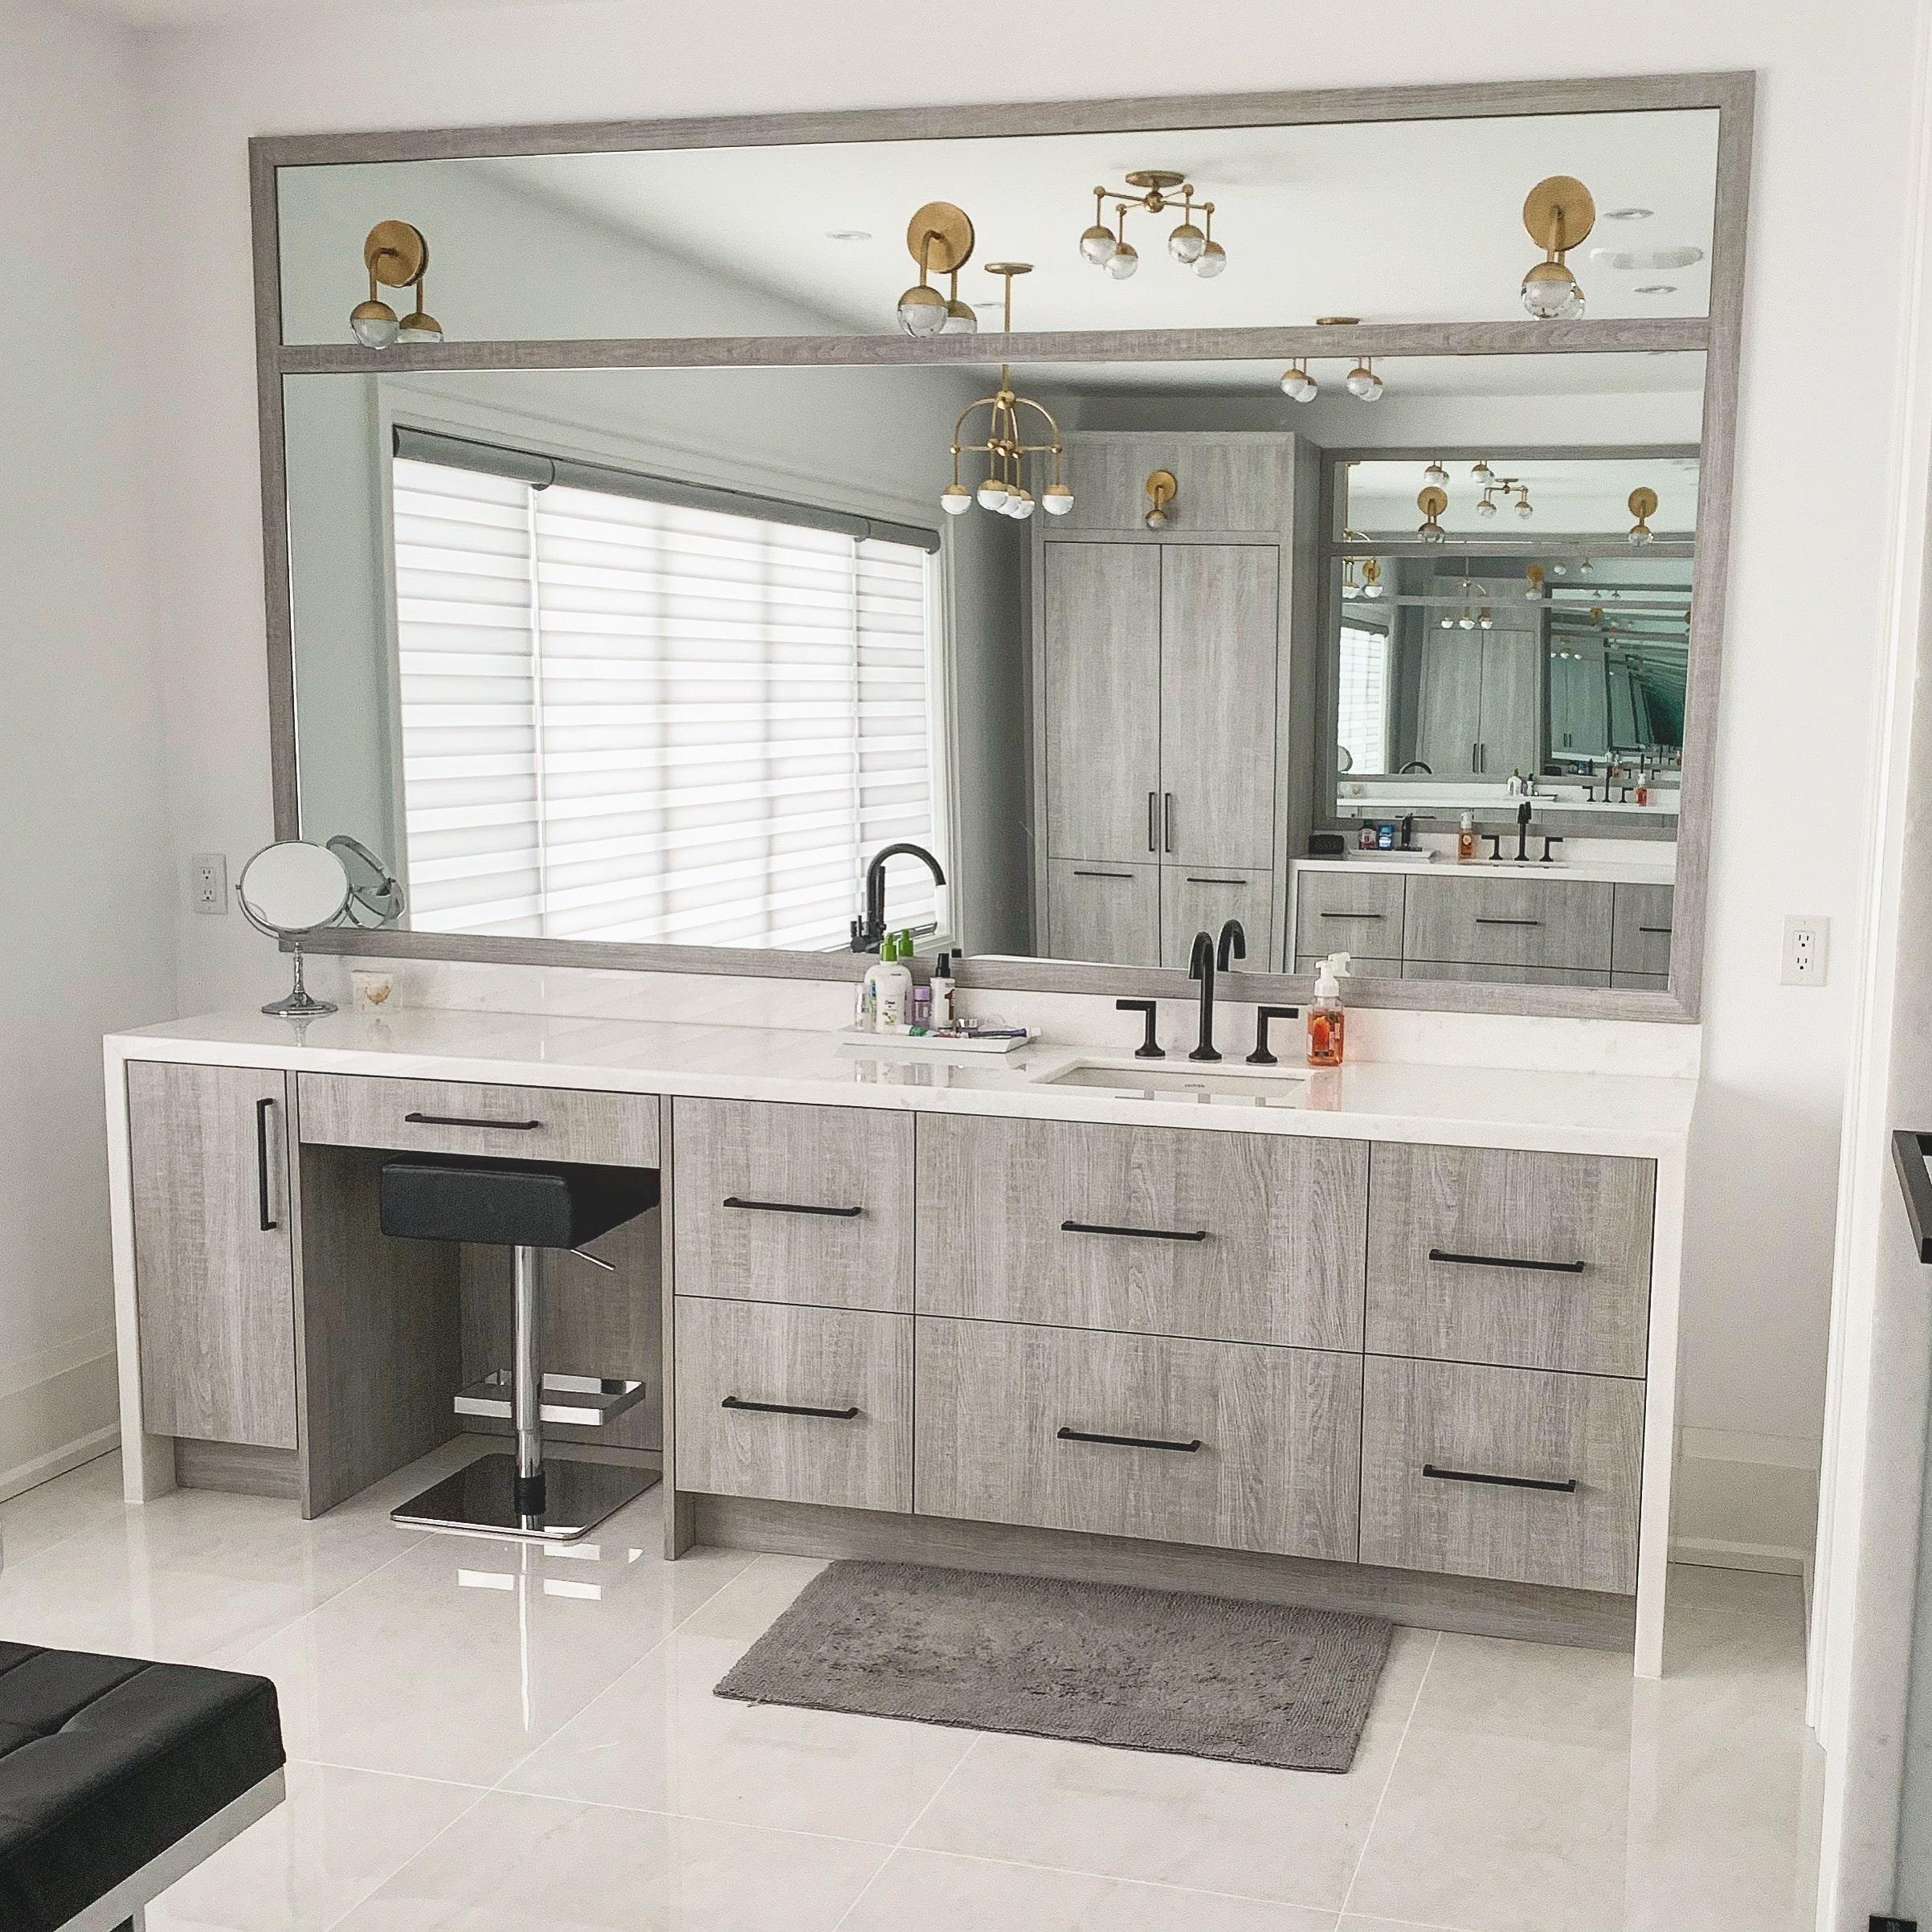 clean modern bathroom with large mirror